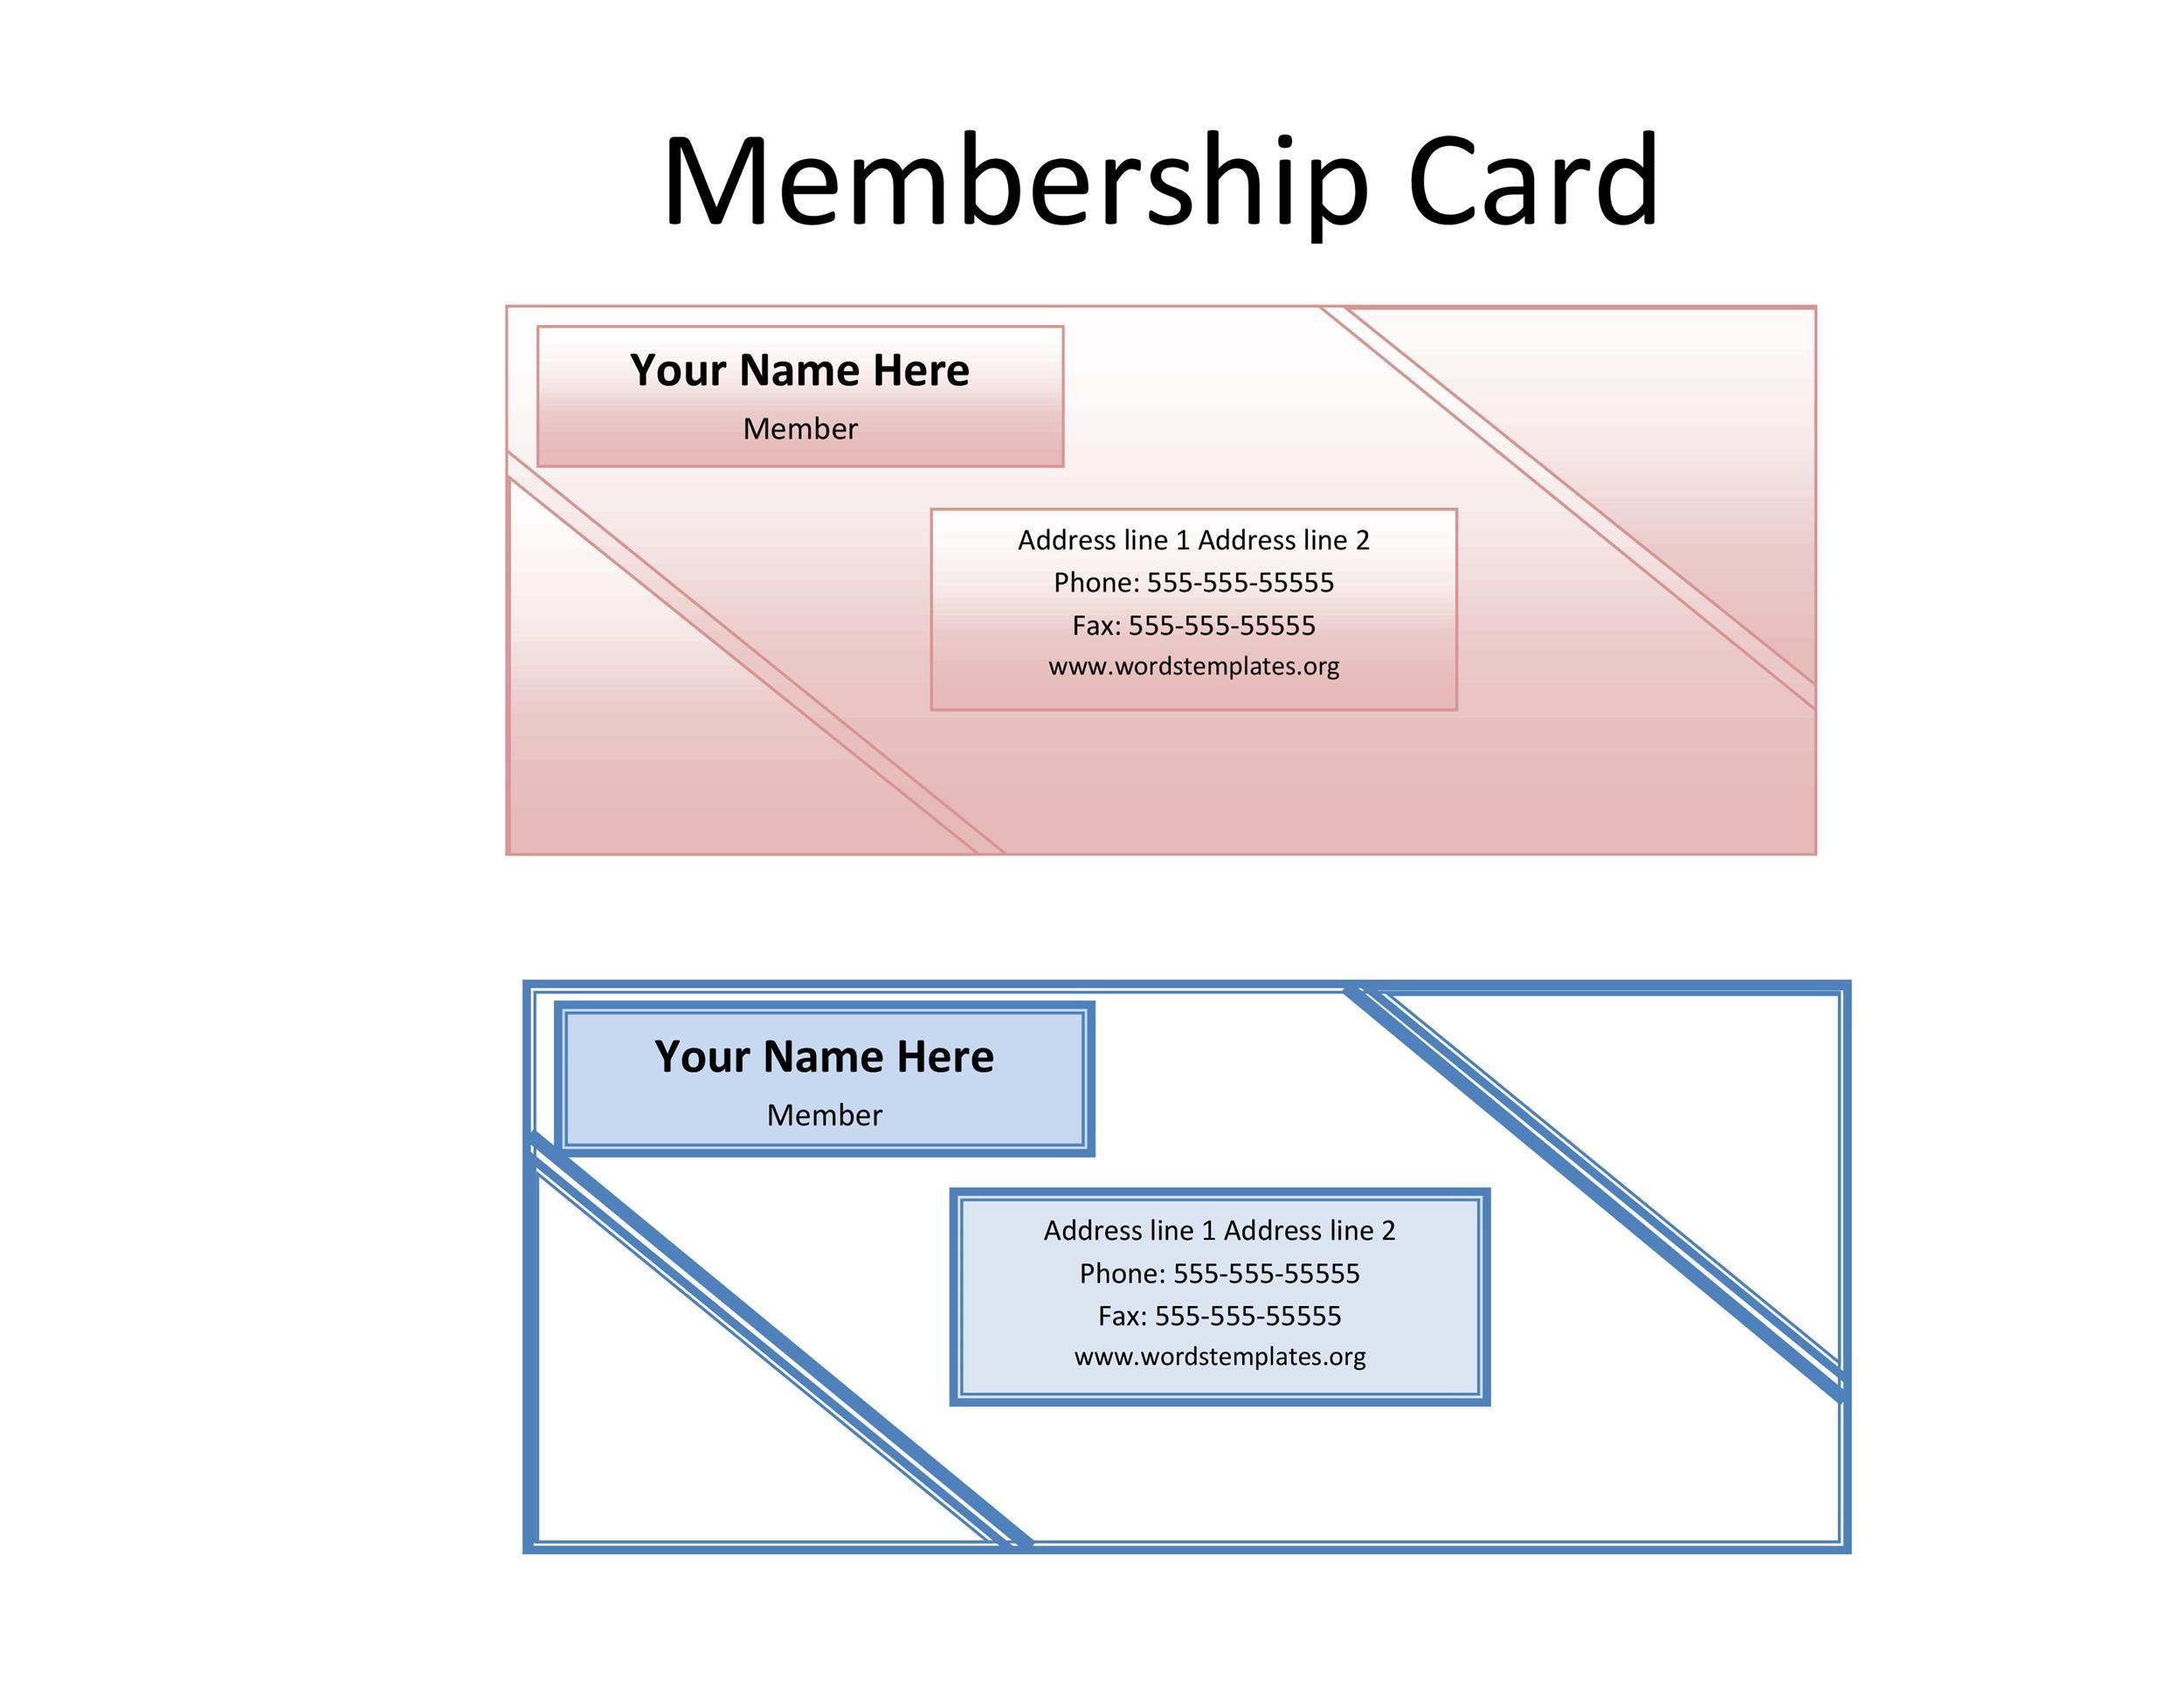 25 Cool Membership Card Templates  Designs (MS Word) ᐅ Template Lab